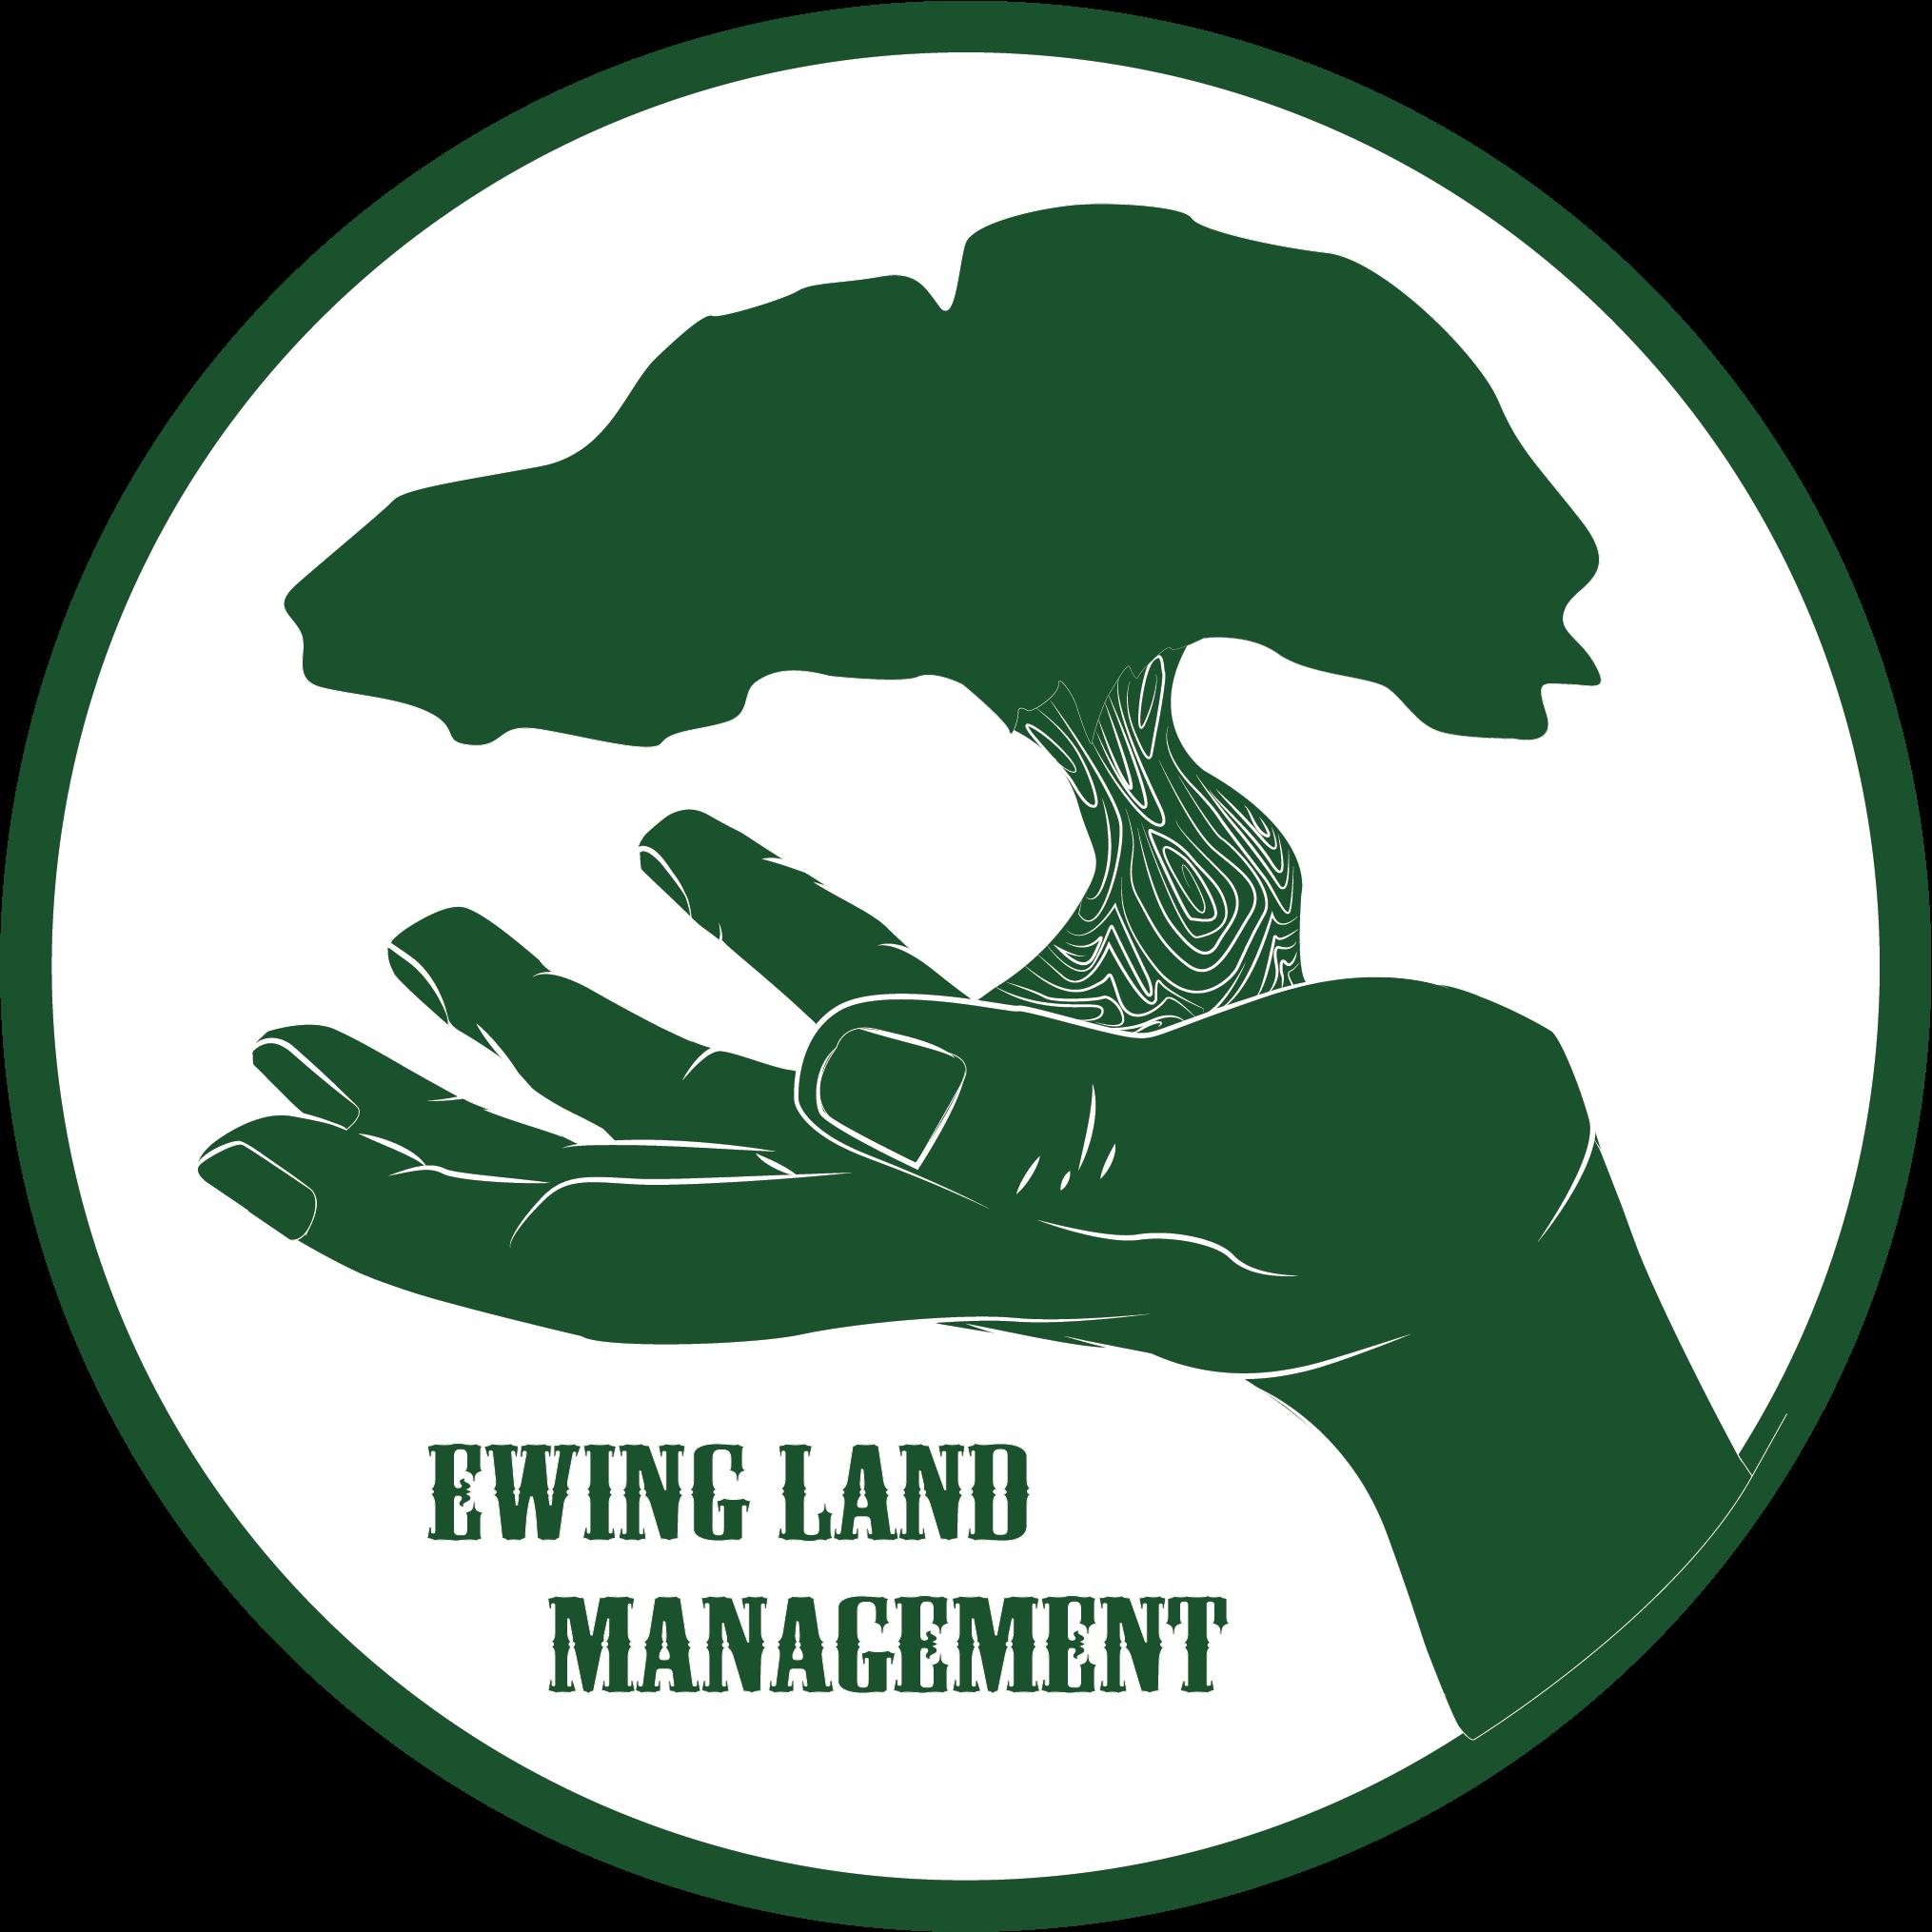 Ewing Land Management logo